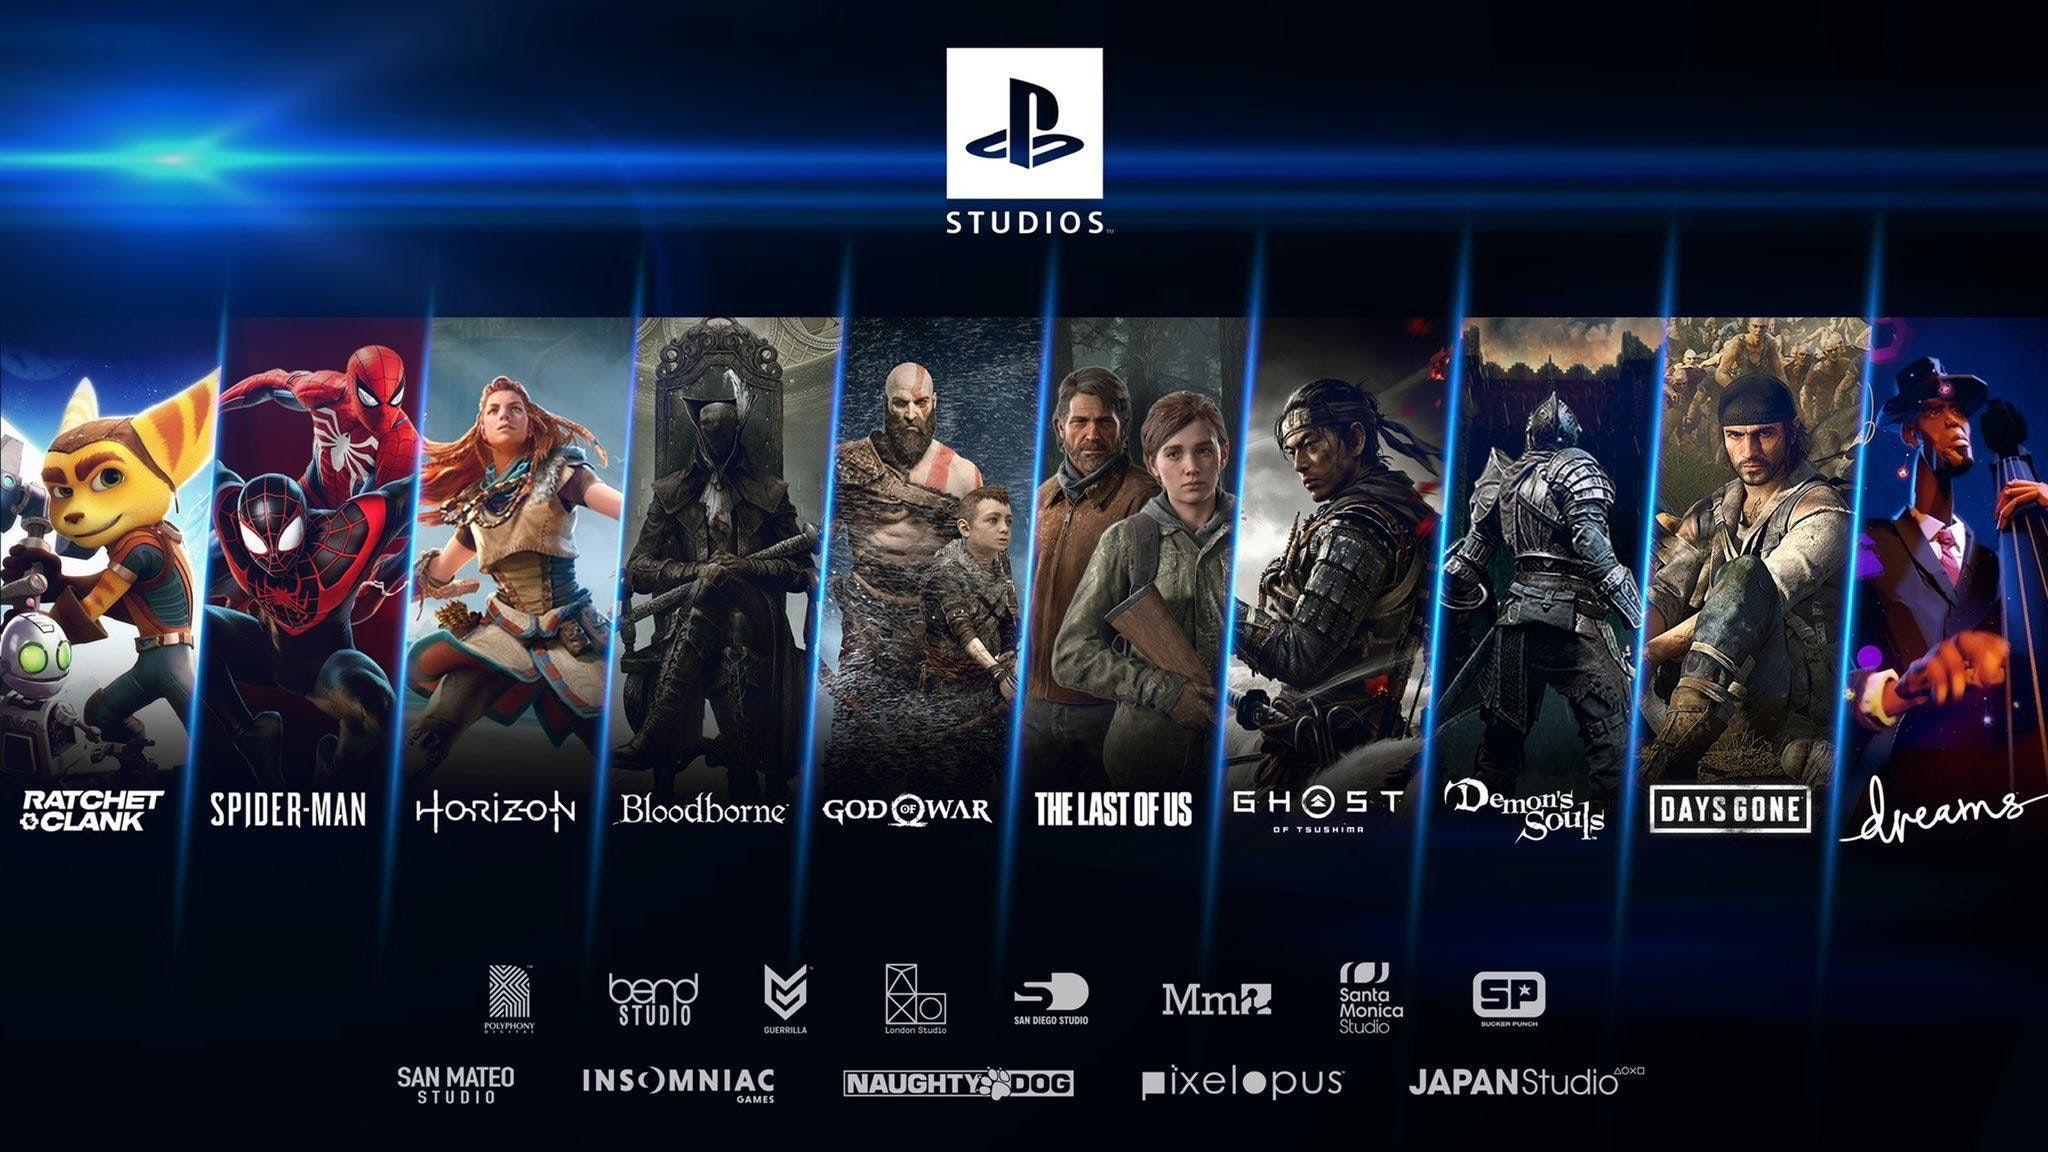 照片中提到了STUDIOS.、THE LAST OF US GHO ST Demonls DAYS GONE、dreams,跟索尼互動娛樂、靈魂有關,包含了遊戲機工作室、的PlayStation 5、的PlayStation 4、SIE全球工作室、退貨